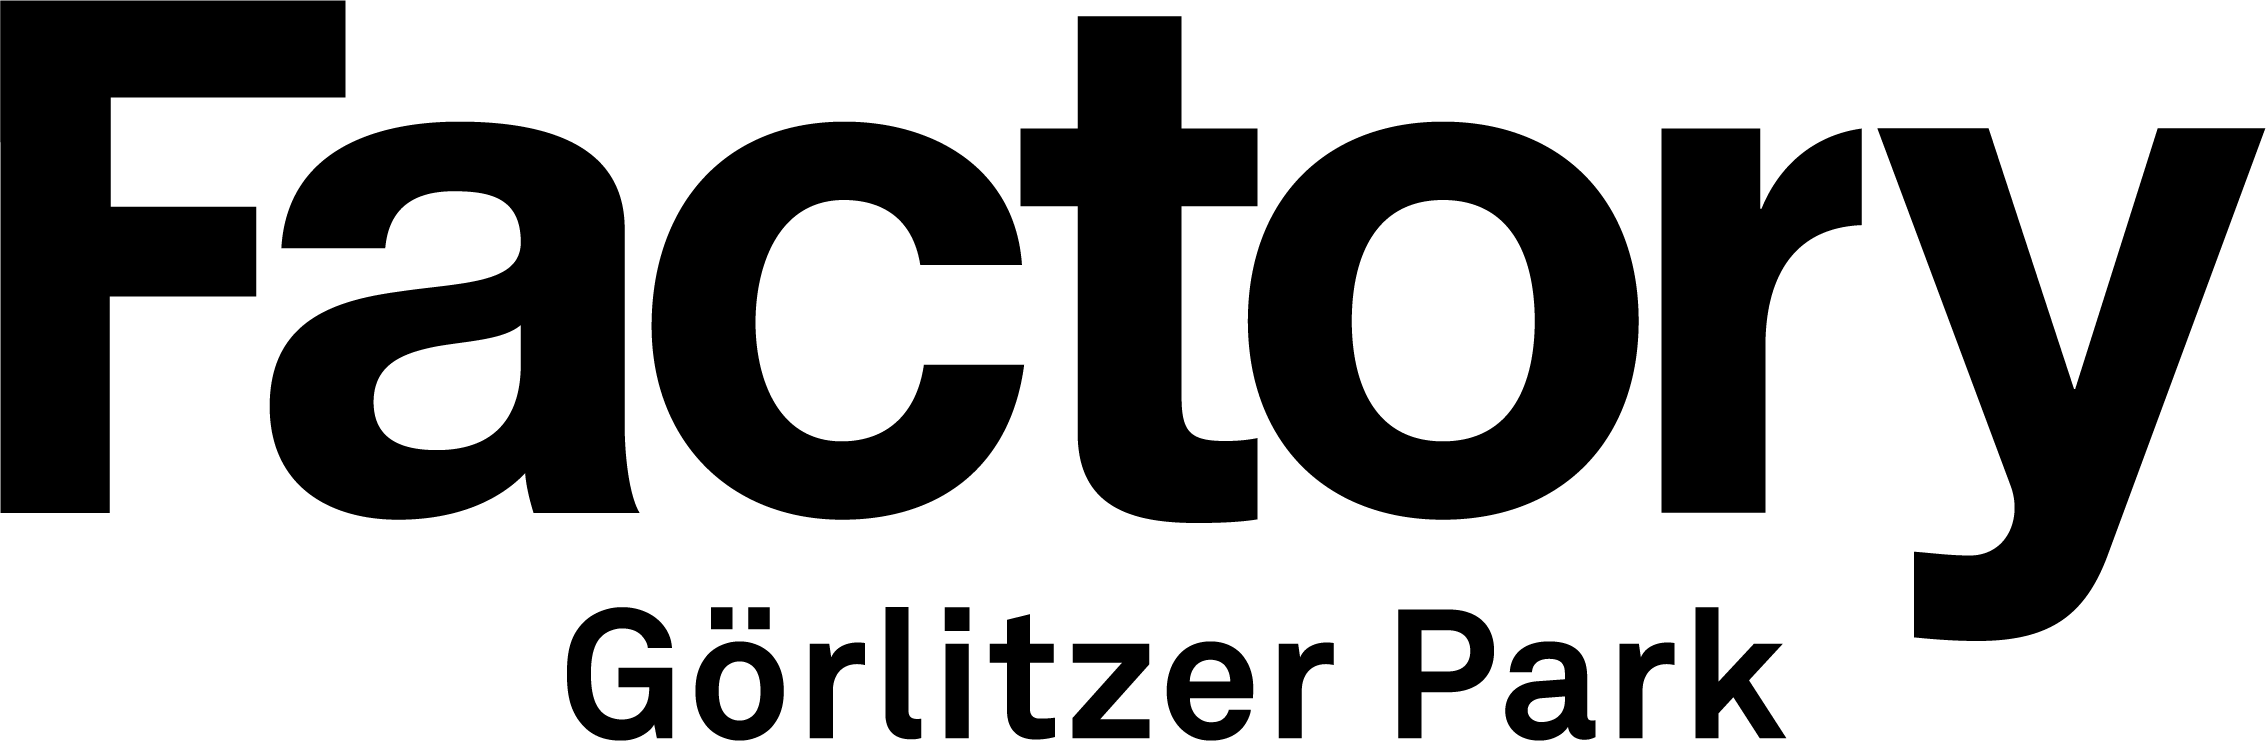 Logo_FactoryGoerlitzerPark_black.png